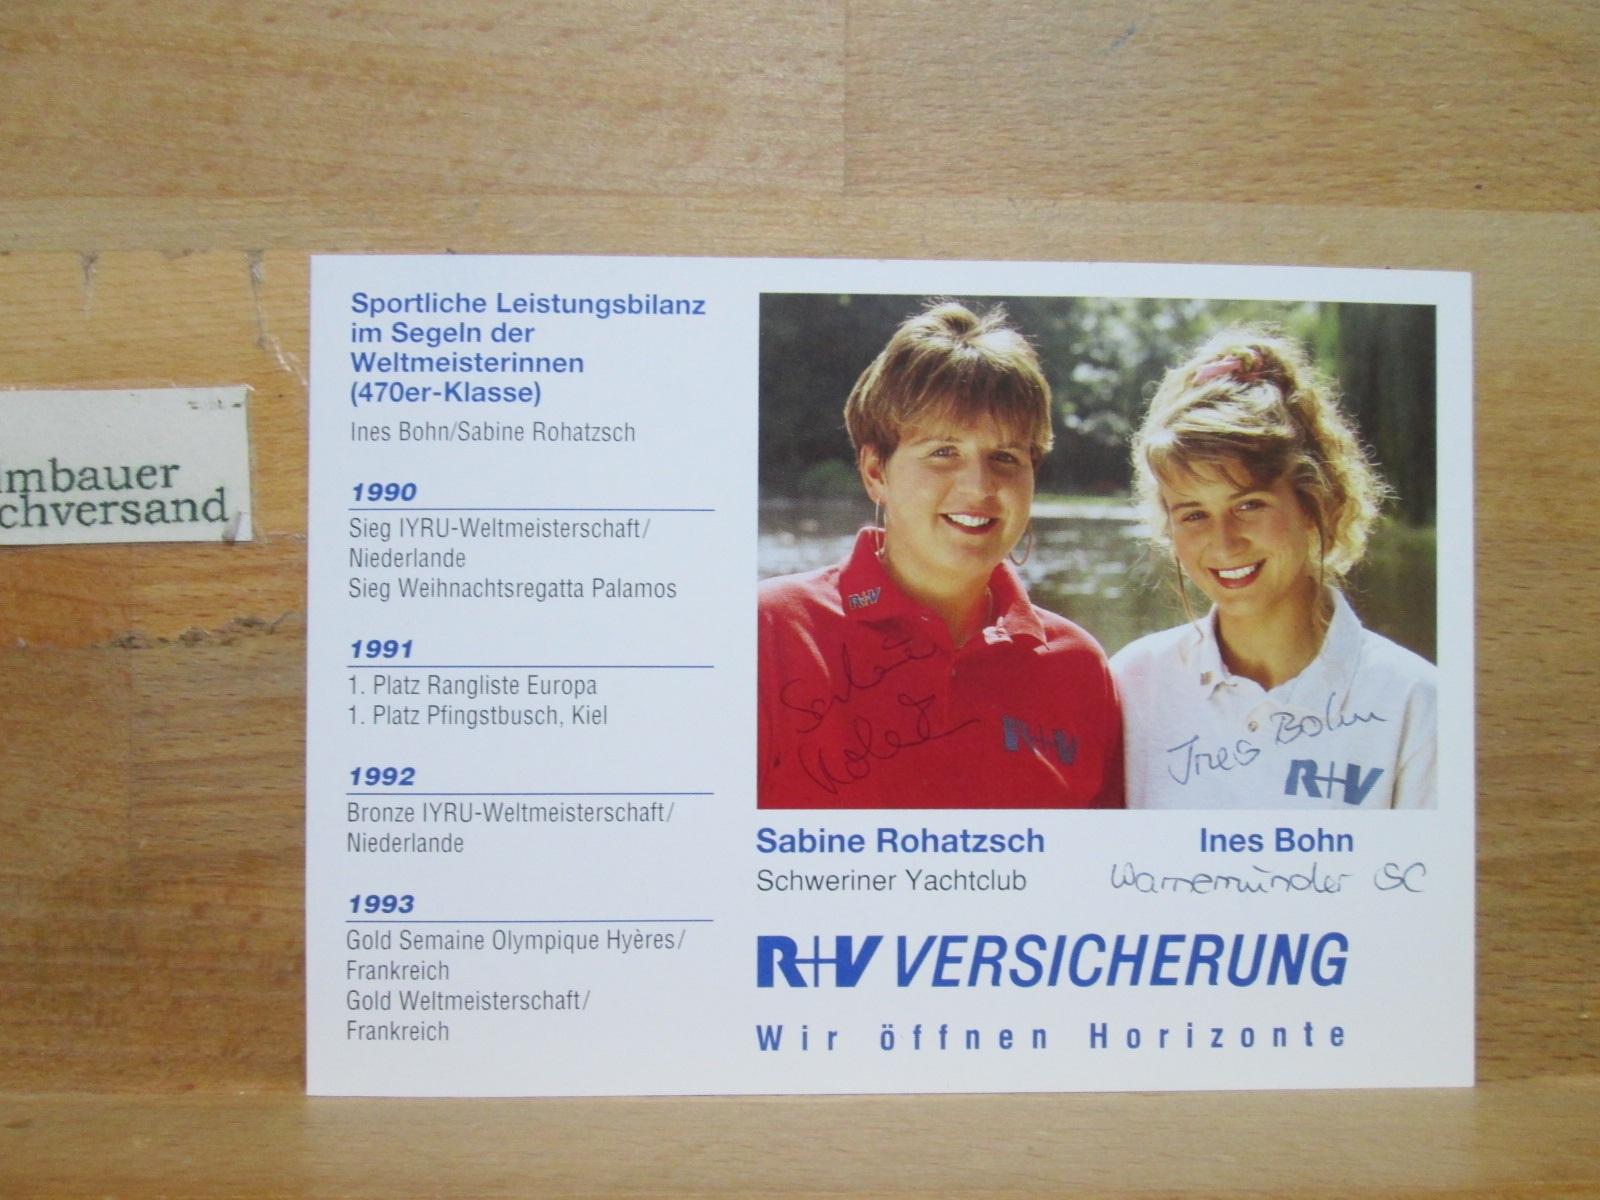 Original Autogramm Sabine Rohatzsch + Ines Bohn Segeln /// Autogramm Autograph signiert signed signee